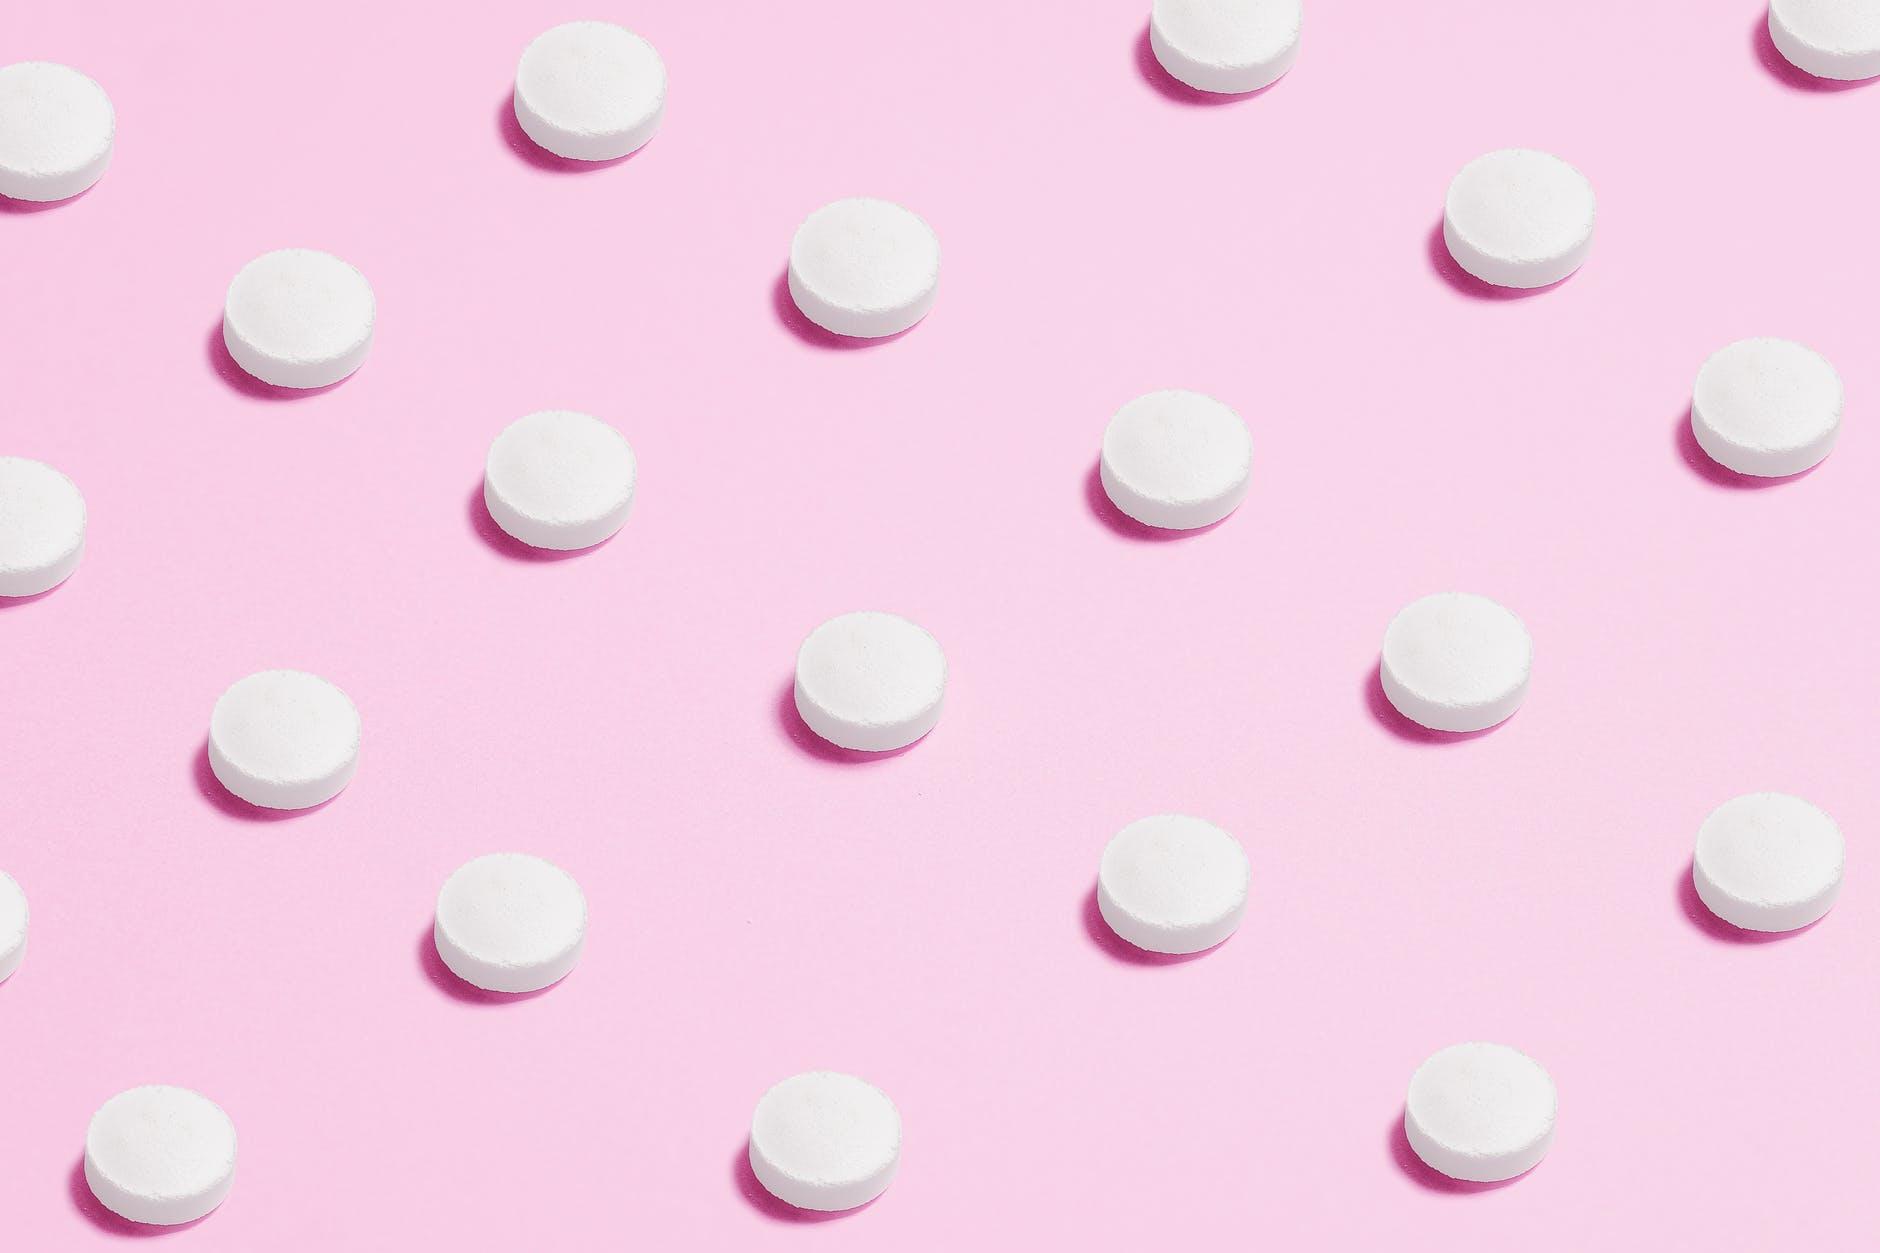 Le offerte di eFarma